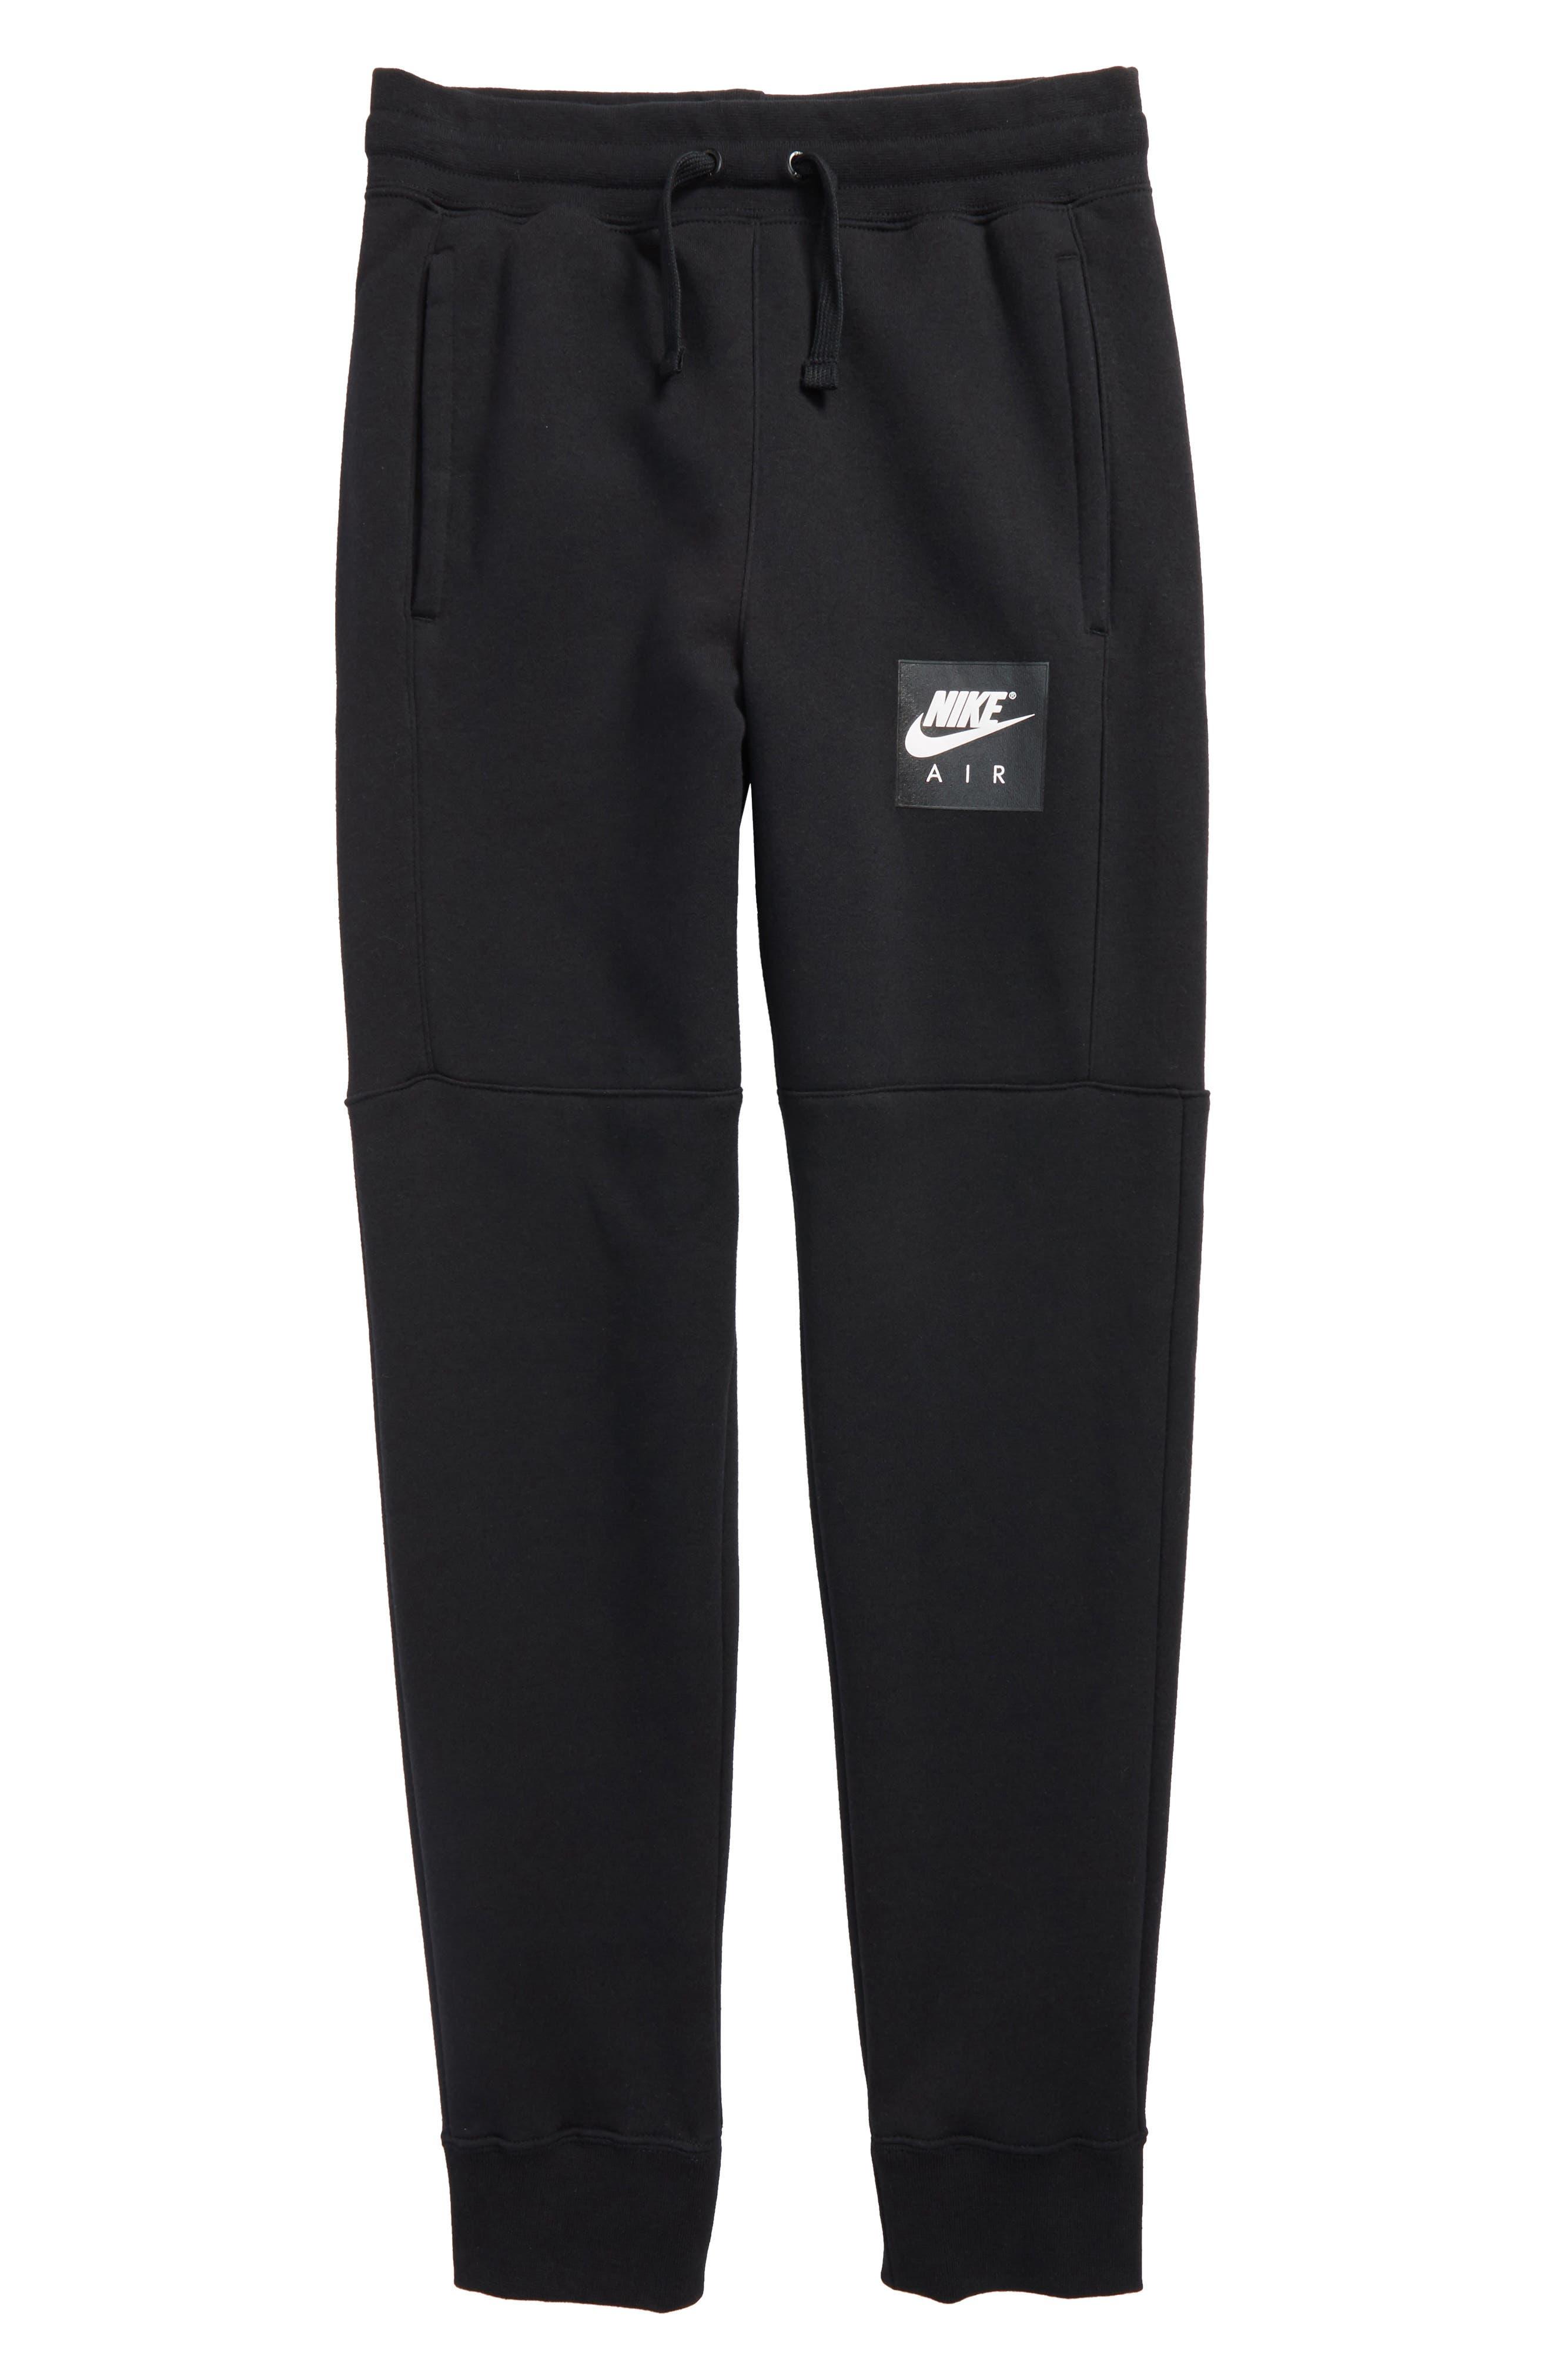 Air Sweatpants,                         Main,                         color, Black/ White